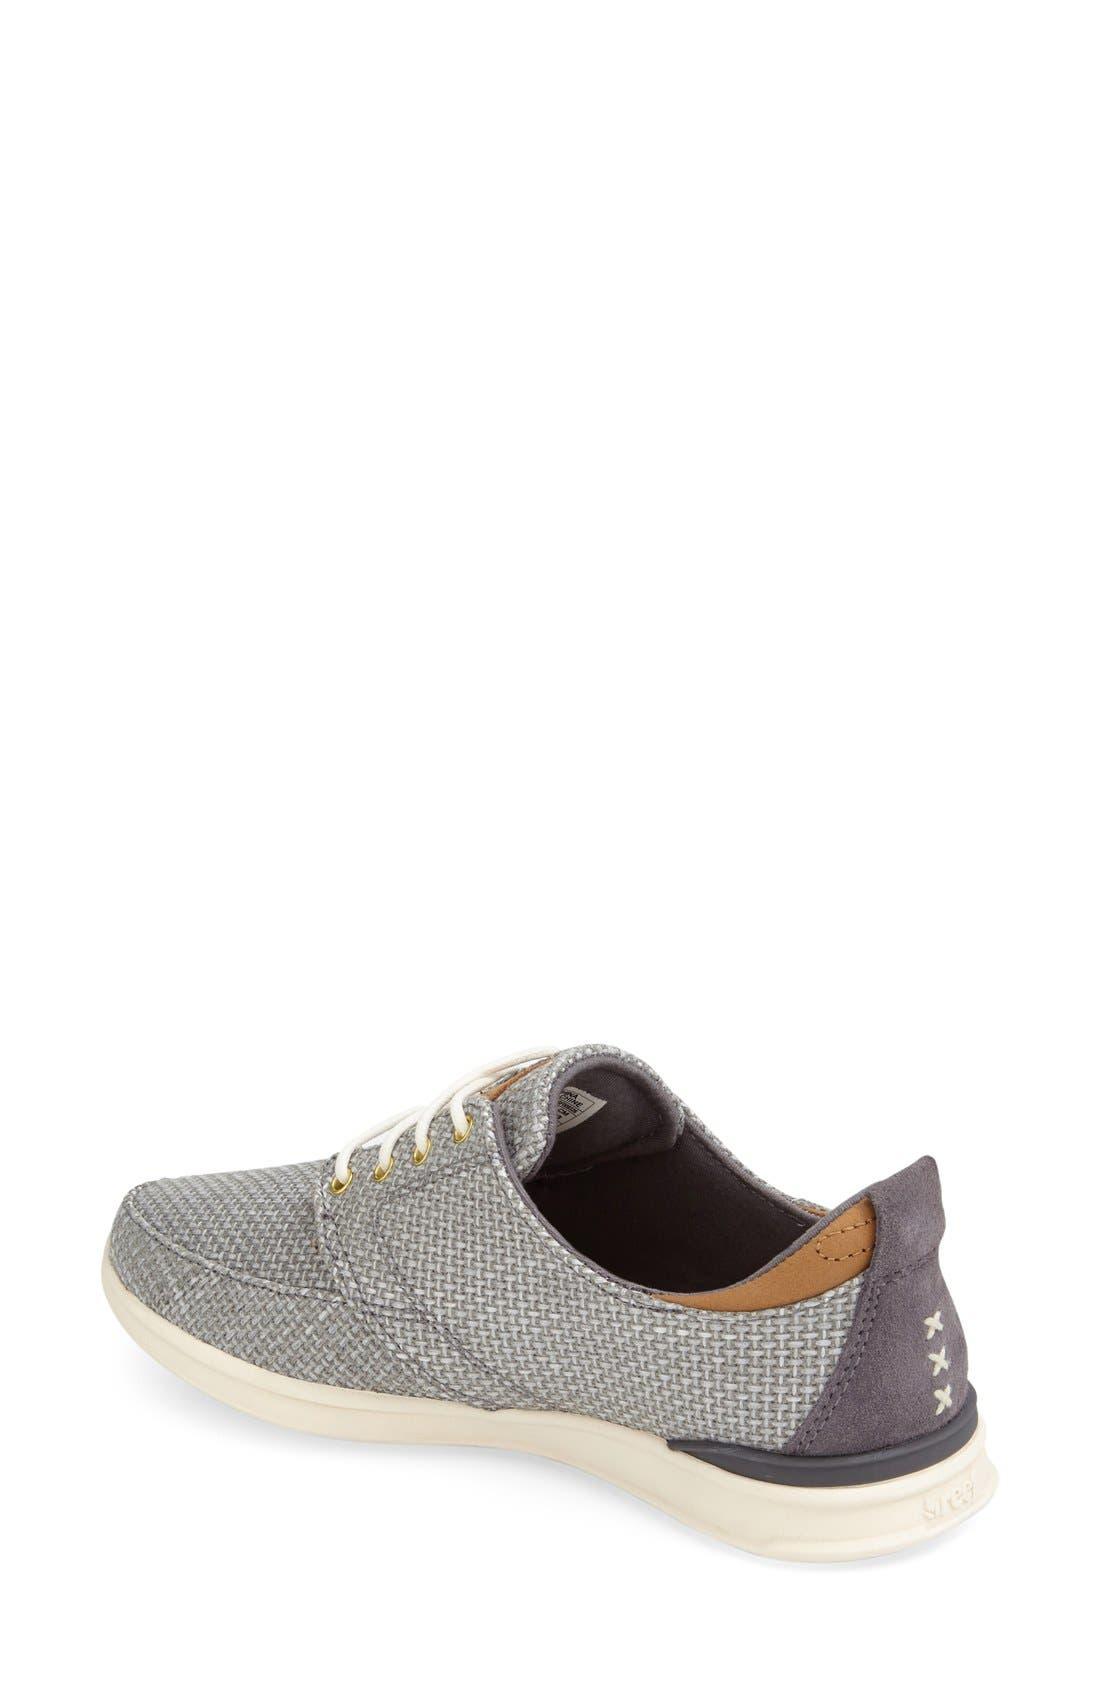 Alternate Image 2  - Reef 'Rover Low' Sneaker (Women)